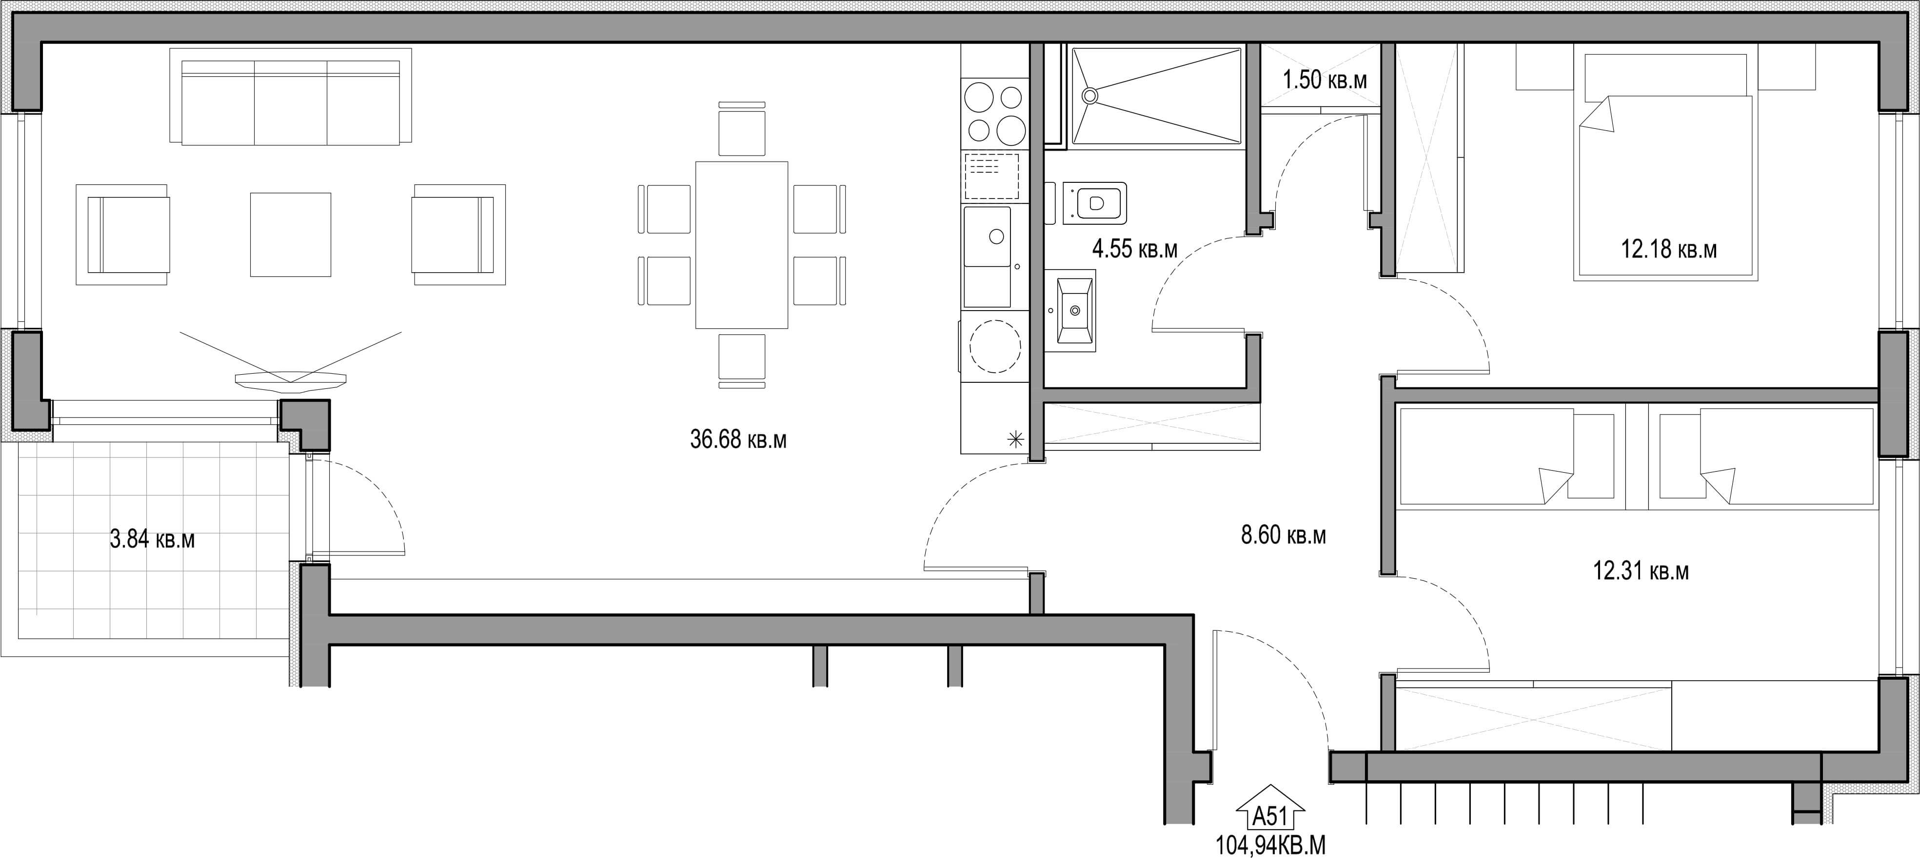 Vinitsa_Apartment_3_51